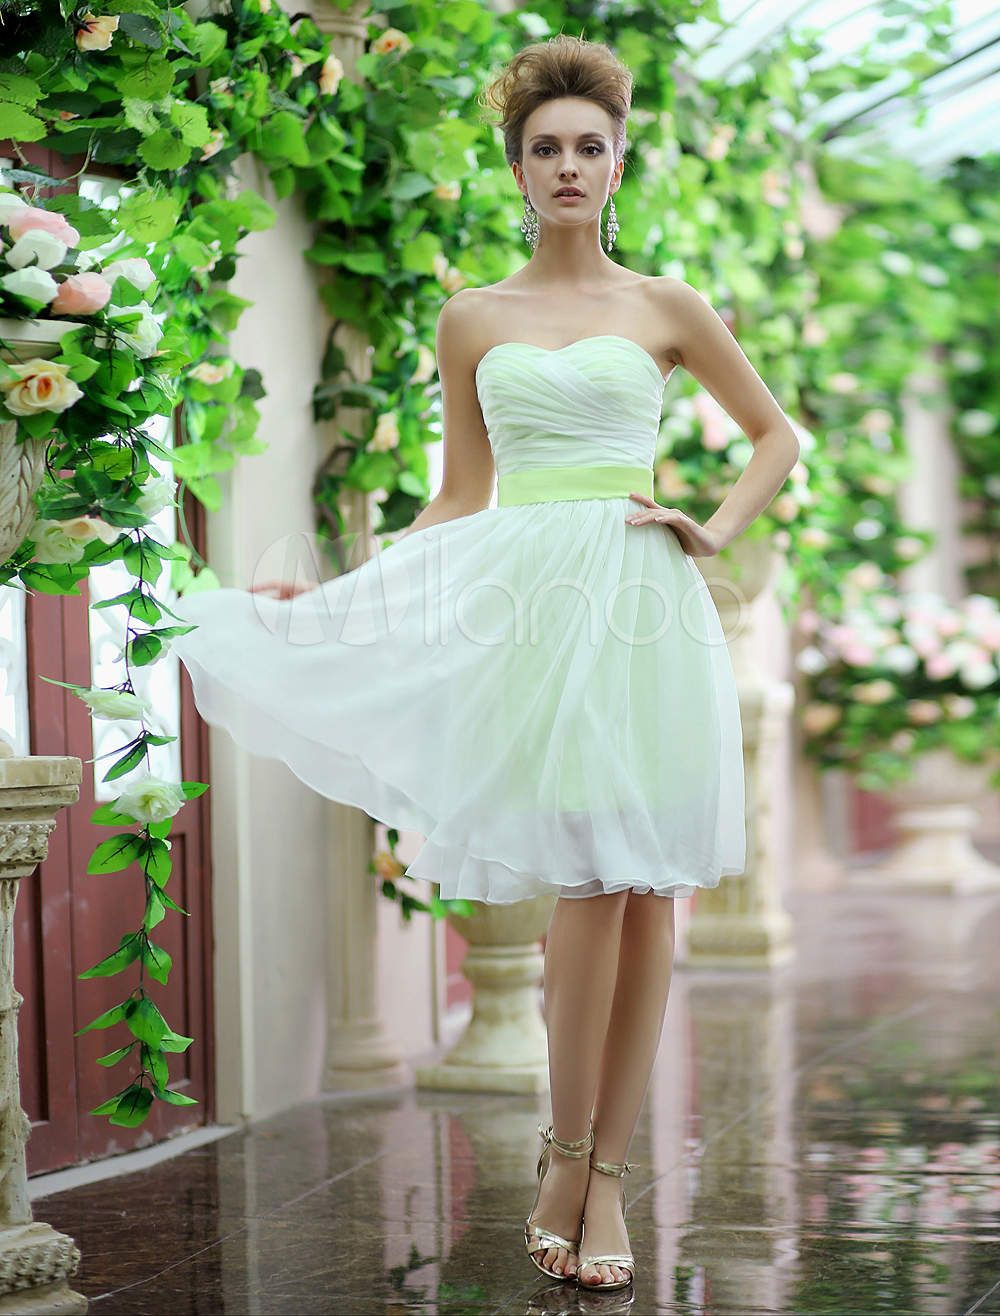 Lime Green Strapless Sash Bow Lace Up Organza Bridesmaid Dress Milanoo